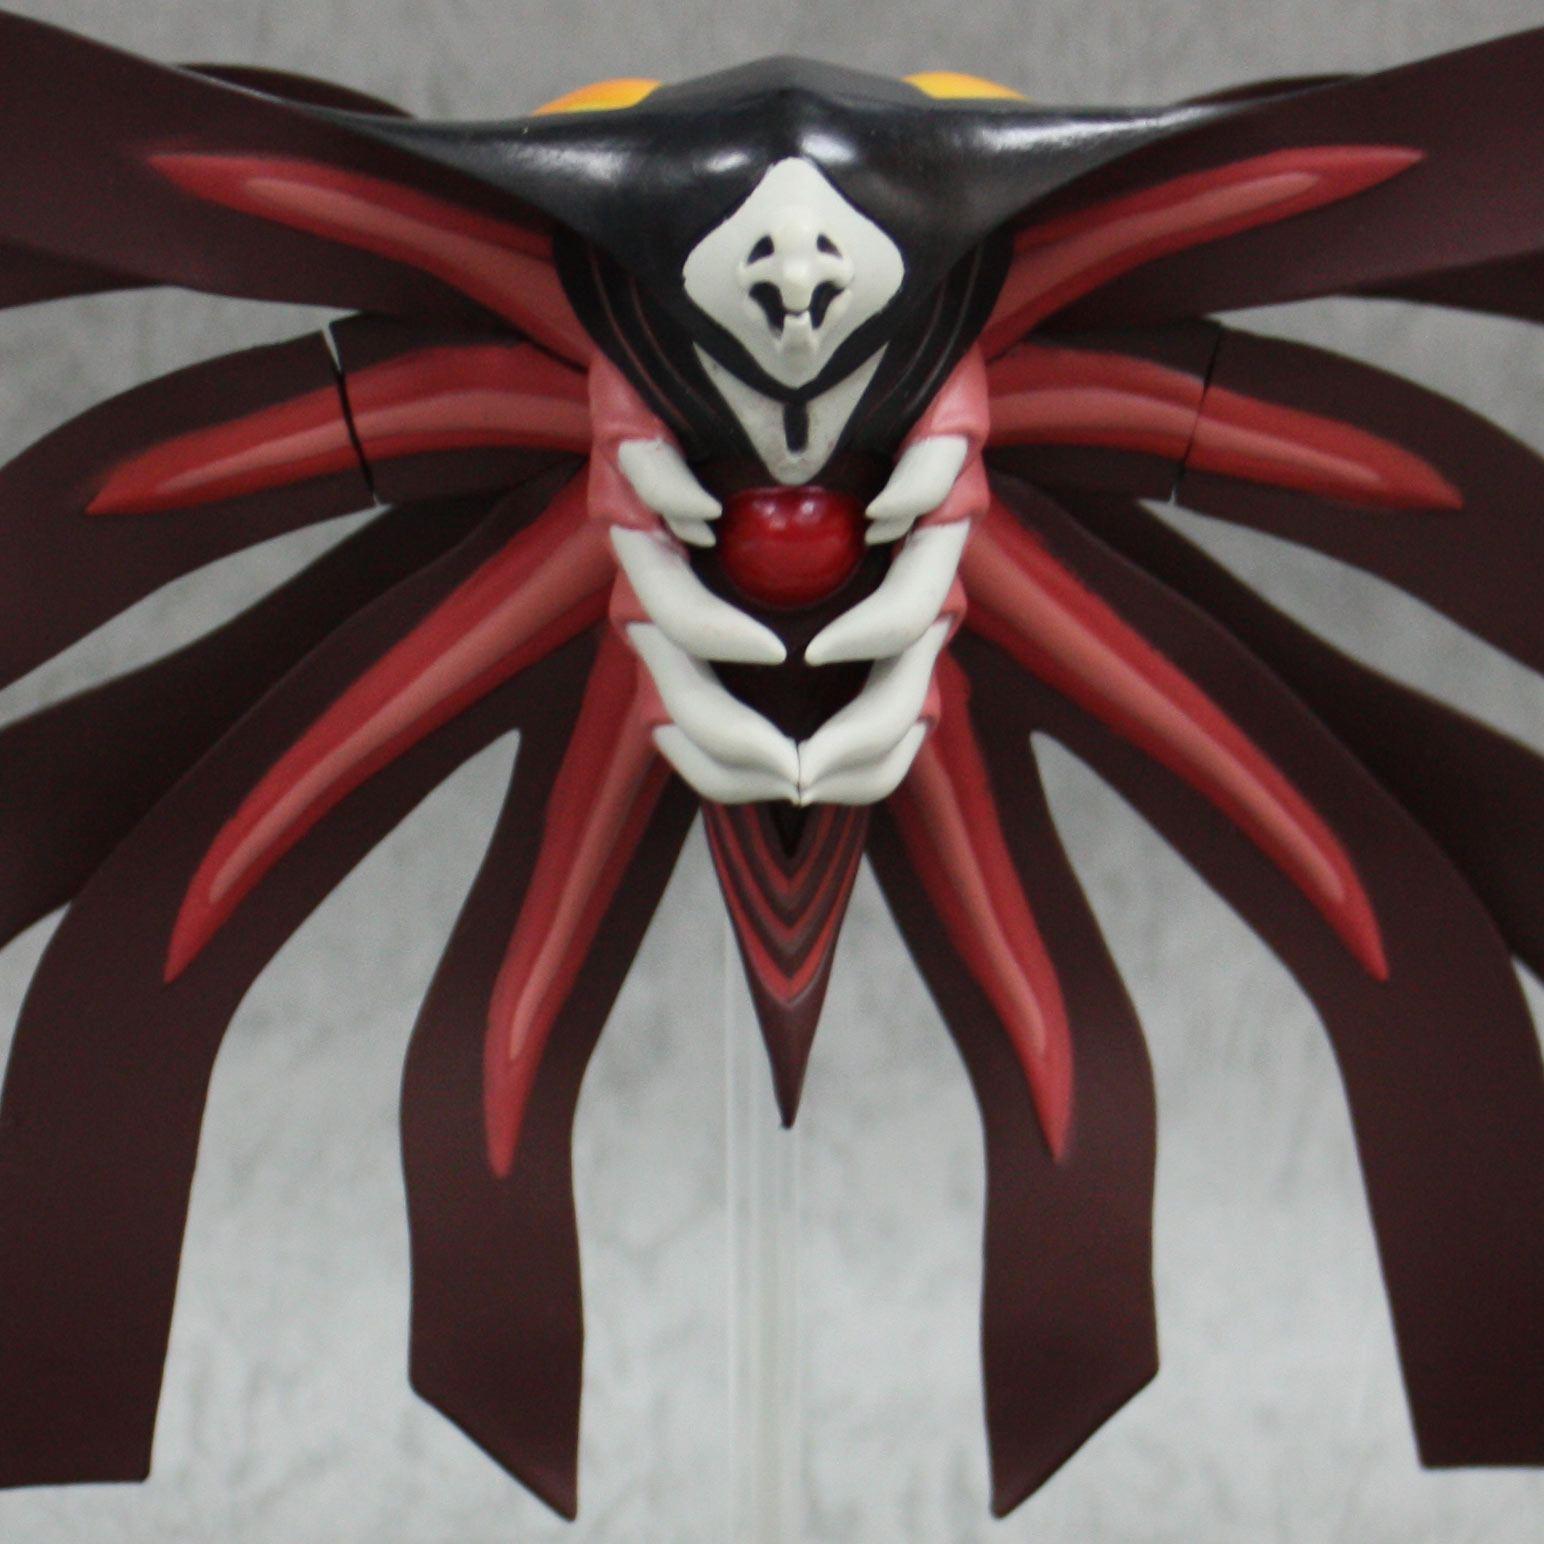 Evangelion HG Versus Figure: 10th Angel